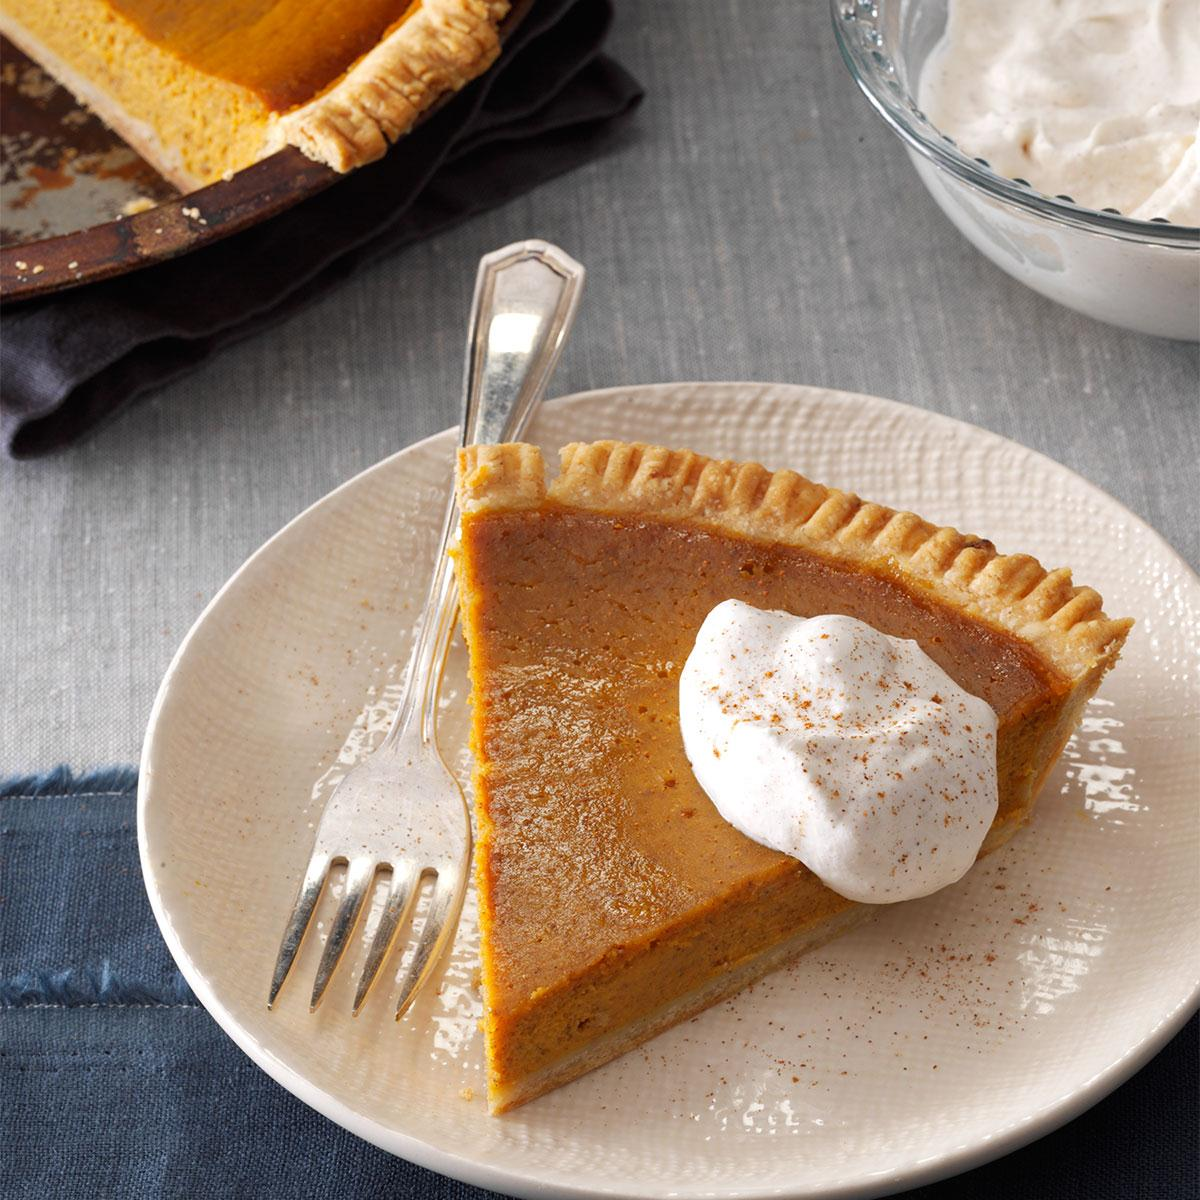 Gingery Pumpkin Pie Recipe | Taste of Home